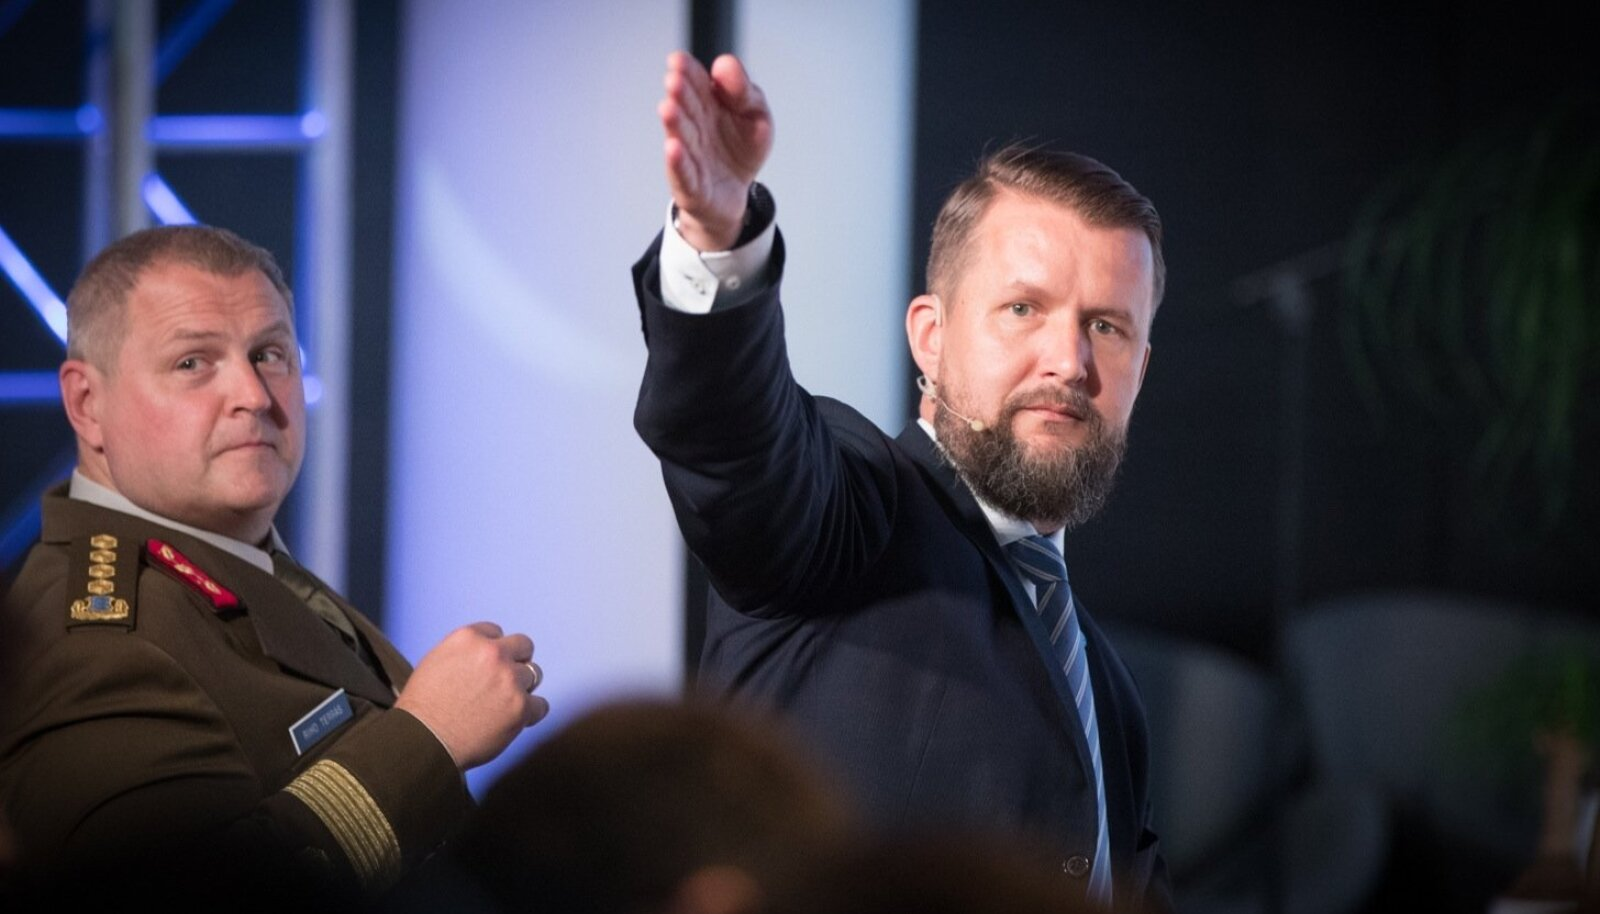 NATO küberkaitsekeskuse juht Sven Sakkov (paremal) juhtimas küberkonfliktikonvernetsi CyCon.